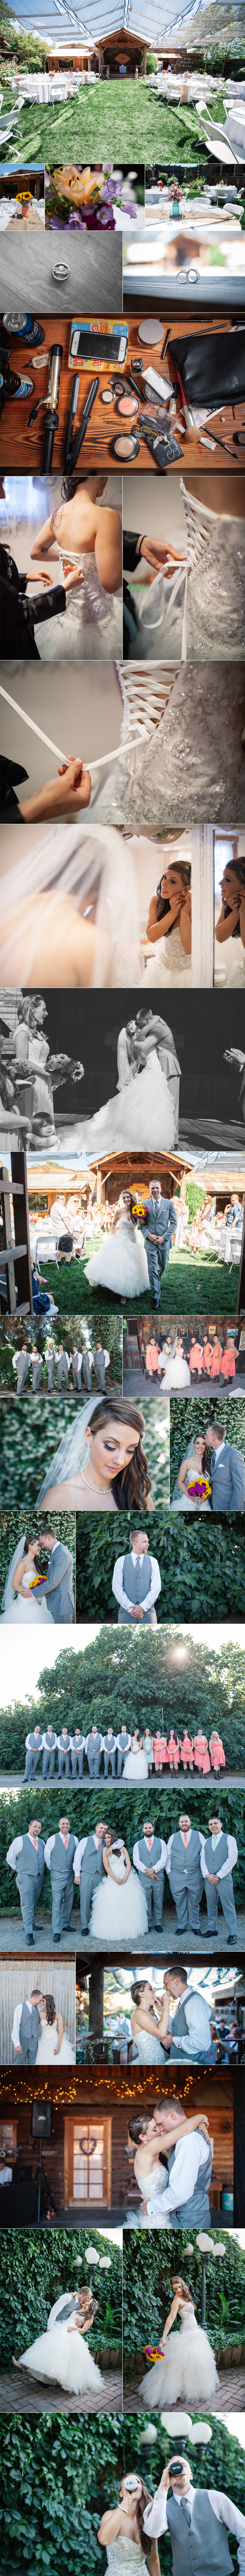 rustic-rose-red-bluff-ca-wedding-photographer.jpg